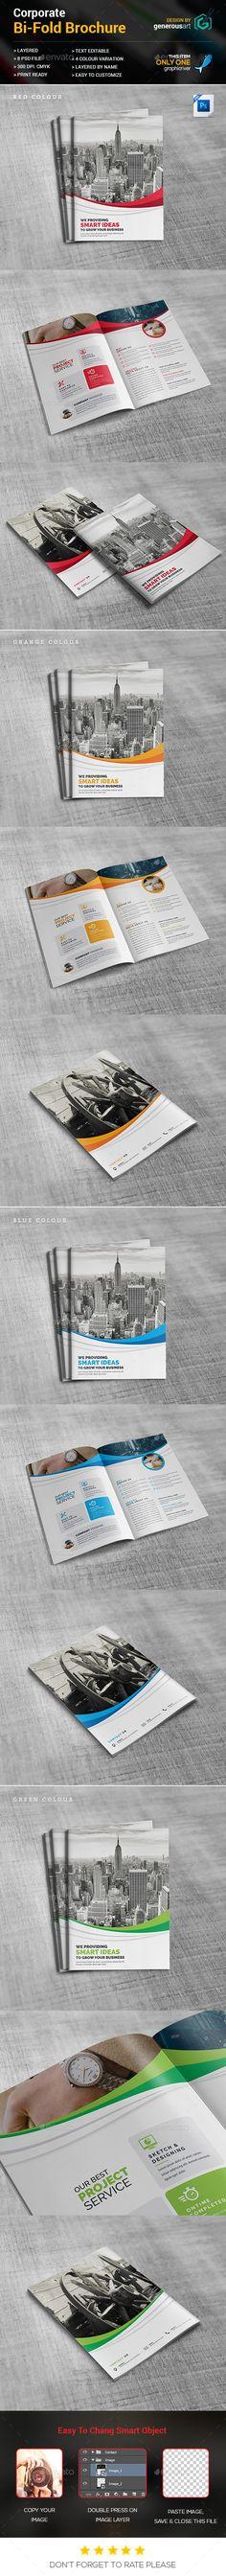 Business Bi-Fold Brochure Template PSD. Download here: https://graphicriver.net/item/business-bifold-brochure/17218729?ref=ksioks